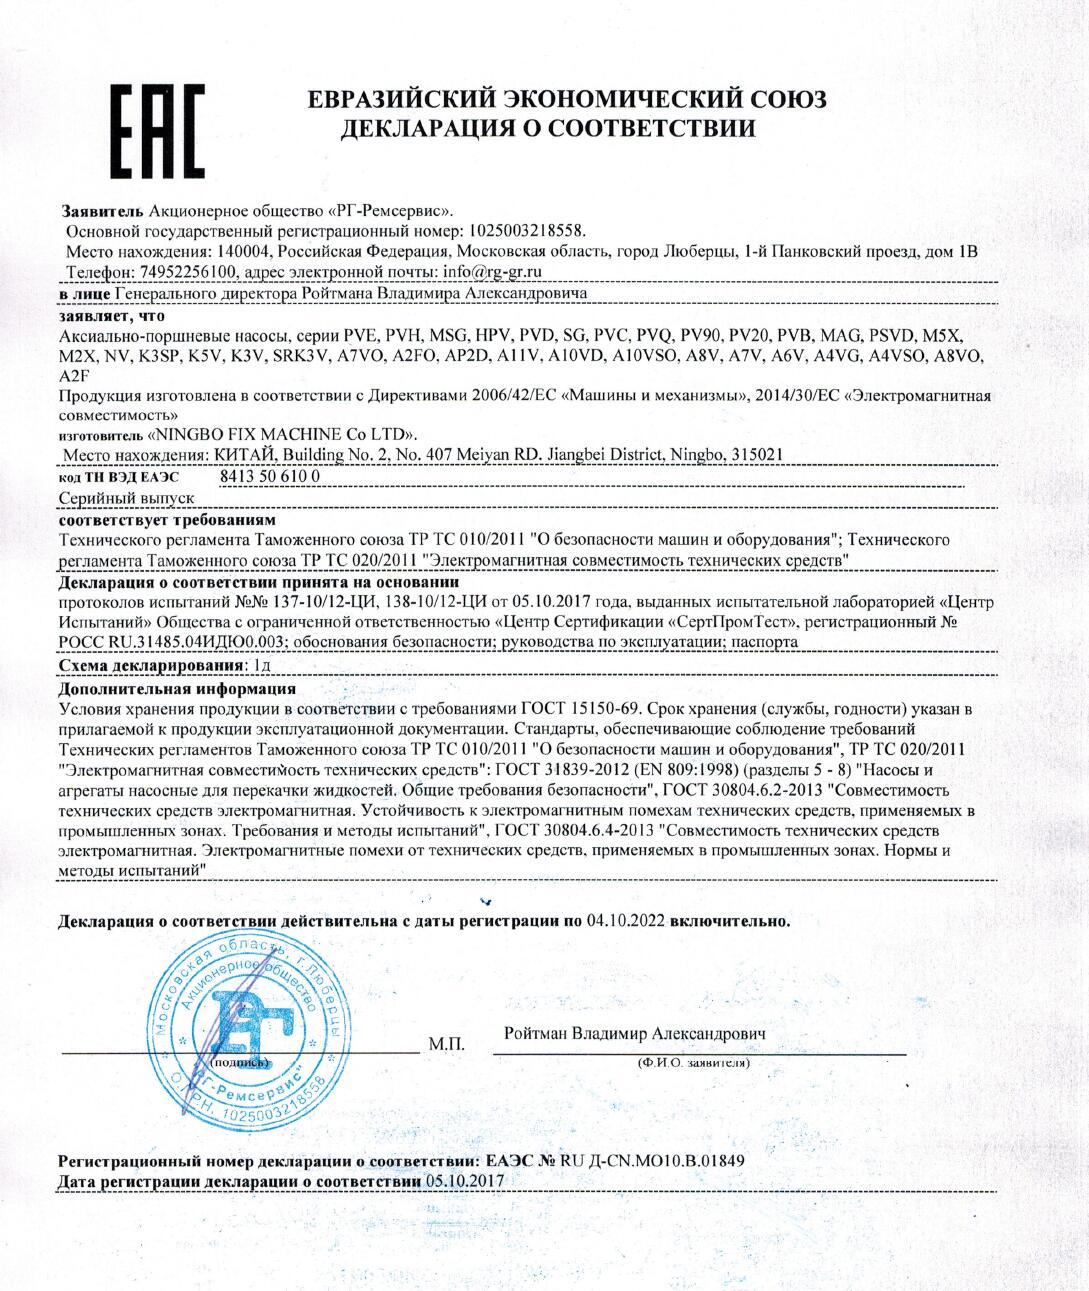 TRCU  Declaration-海关联盟符合性声明